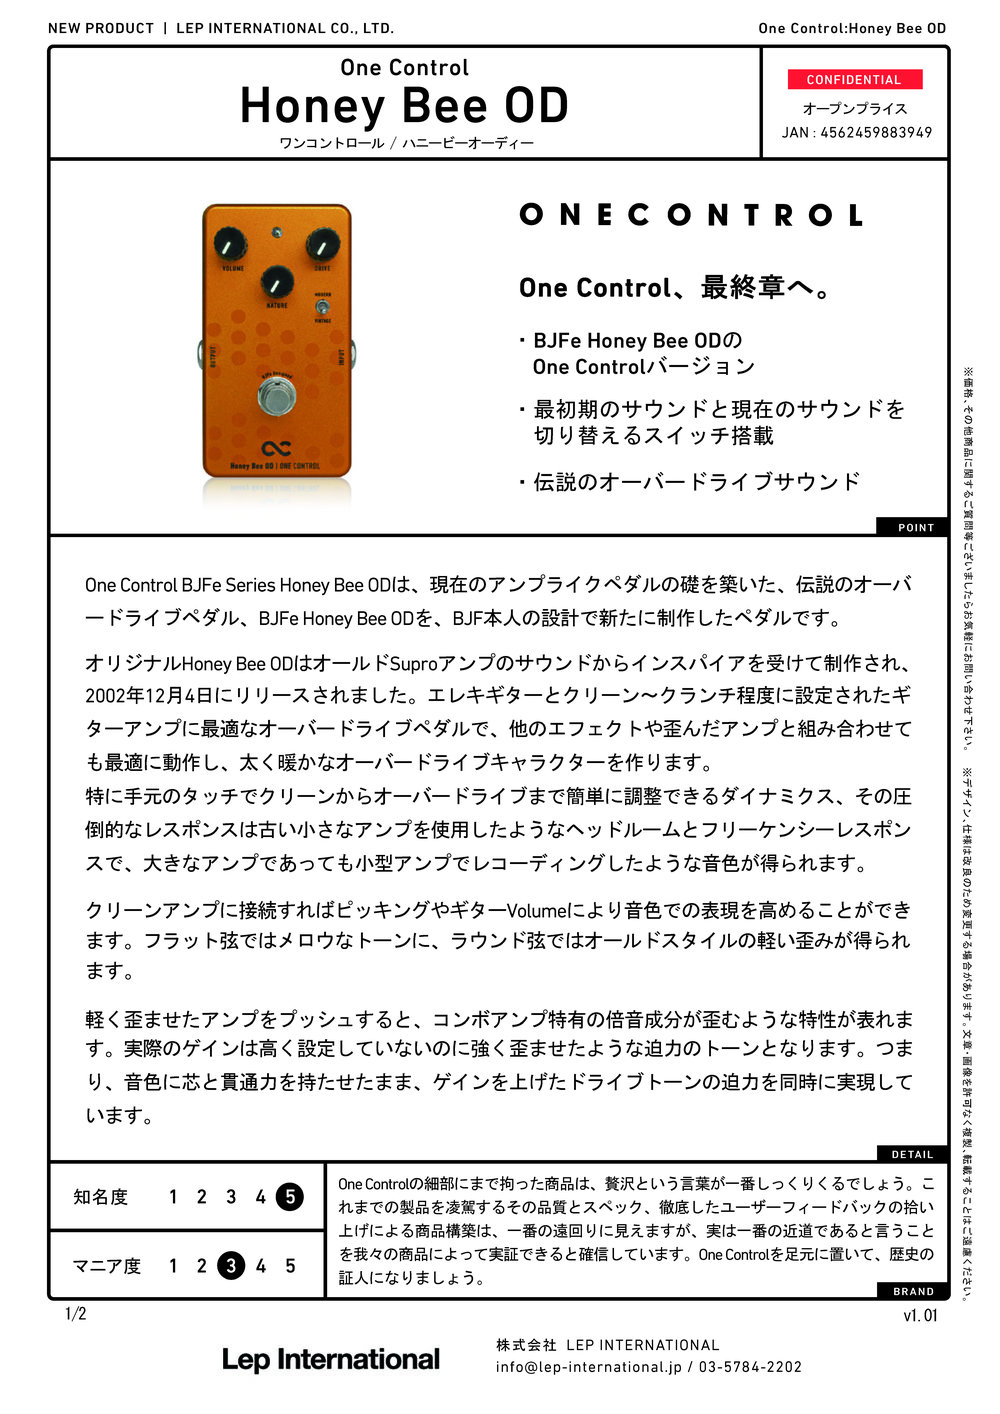 onecontrol honeybeeod v1.01_ページ_1.jpg